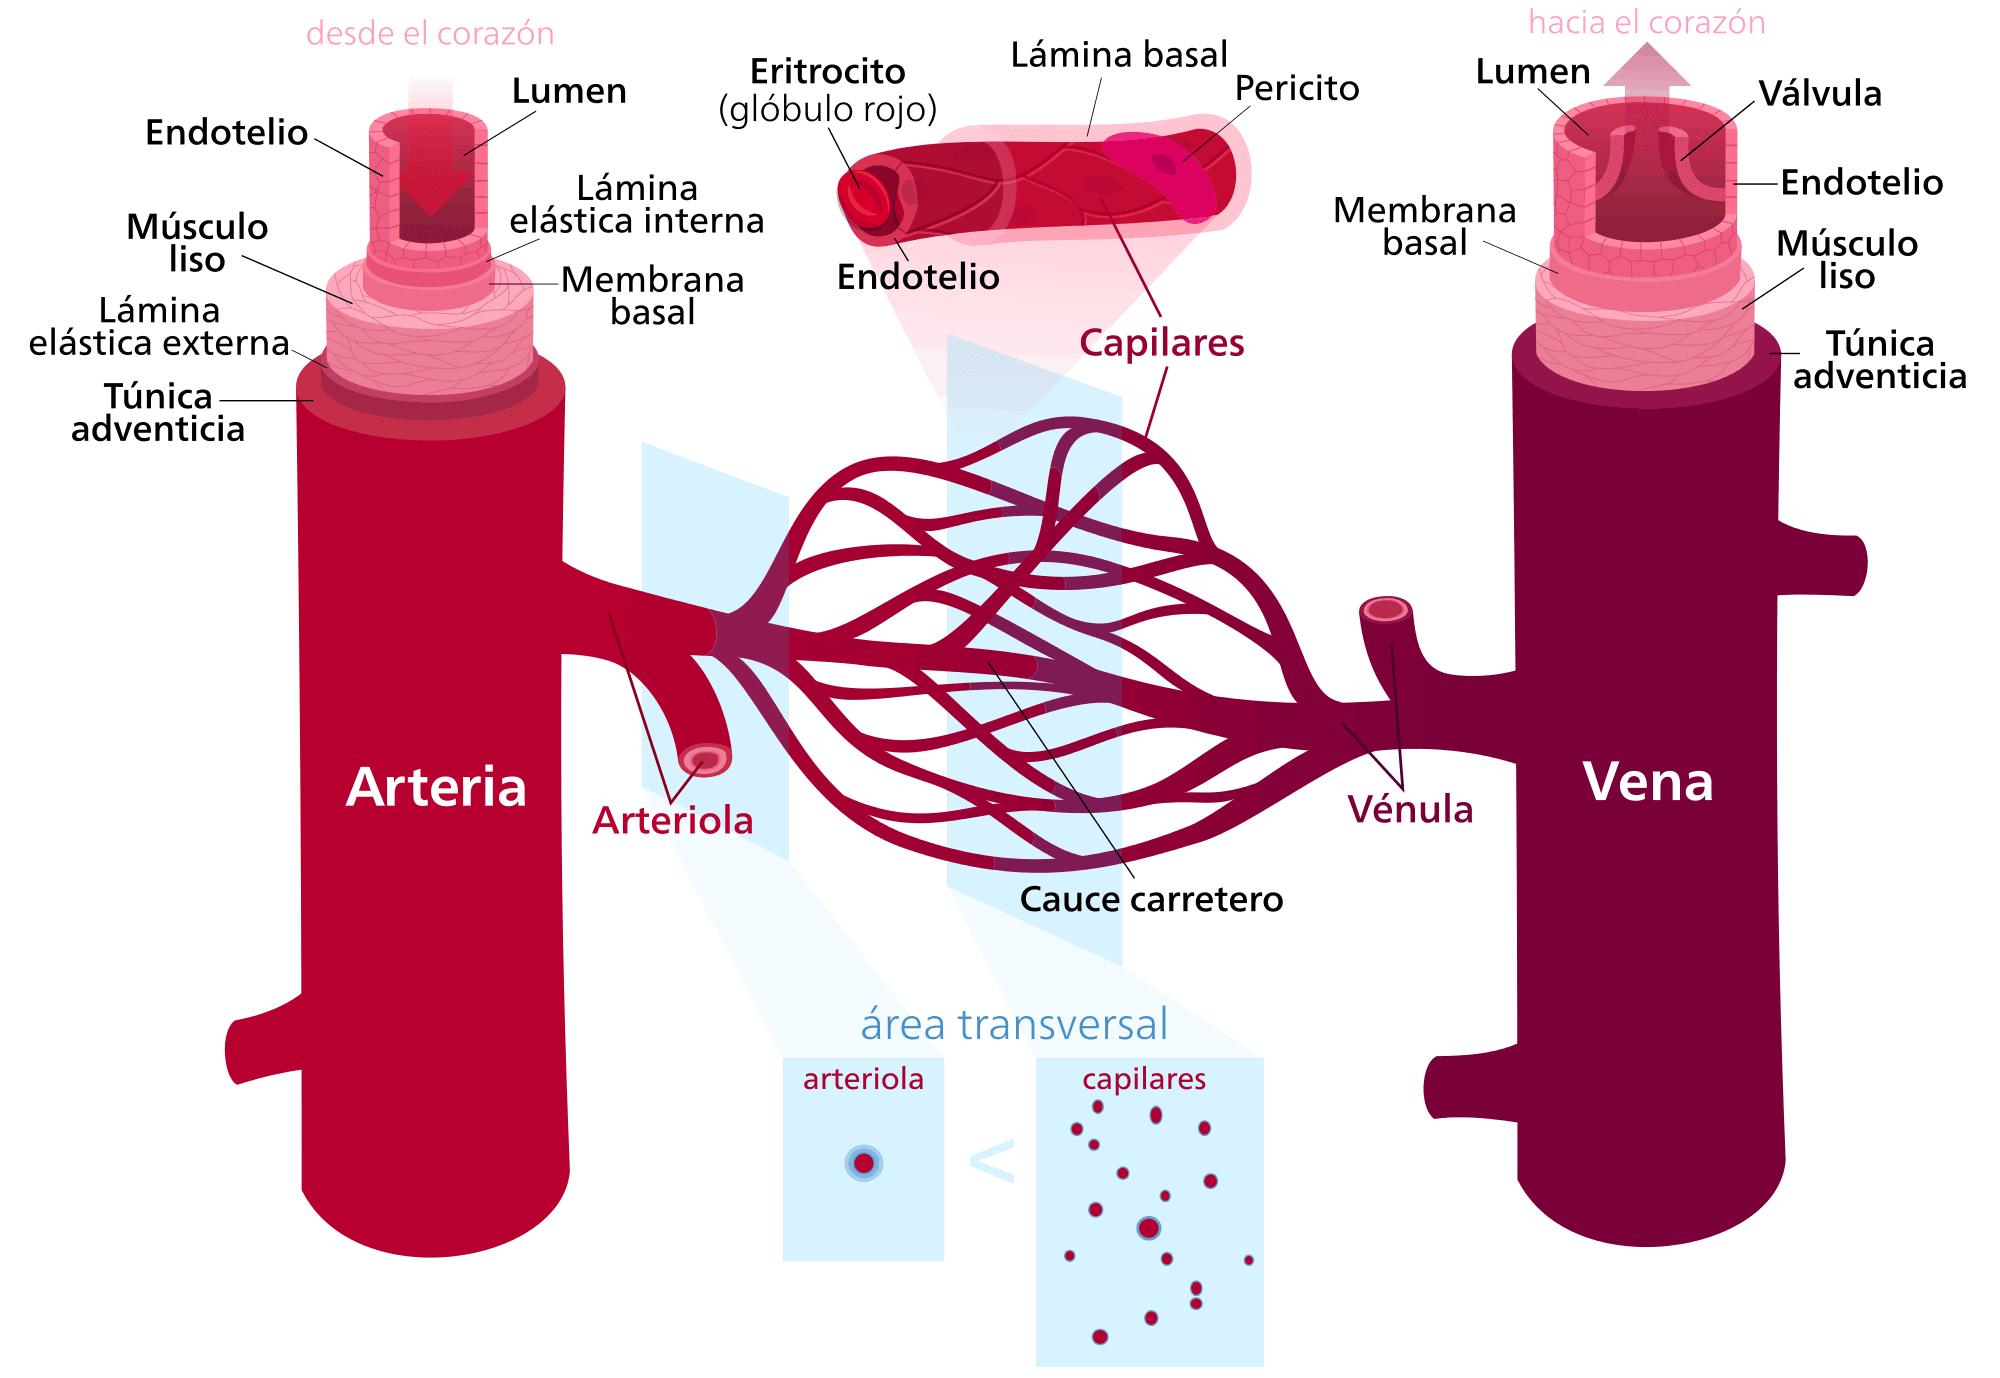 Tipos vasos sanguíneos